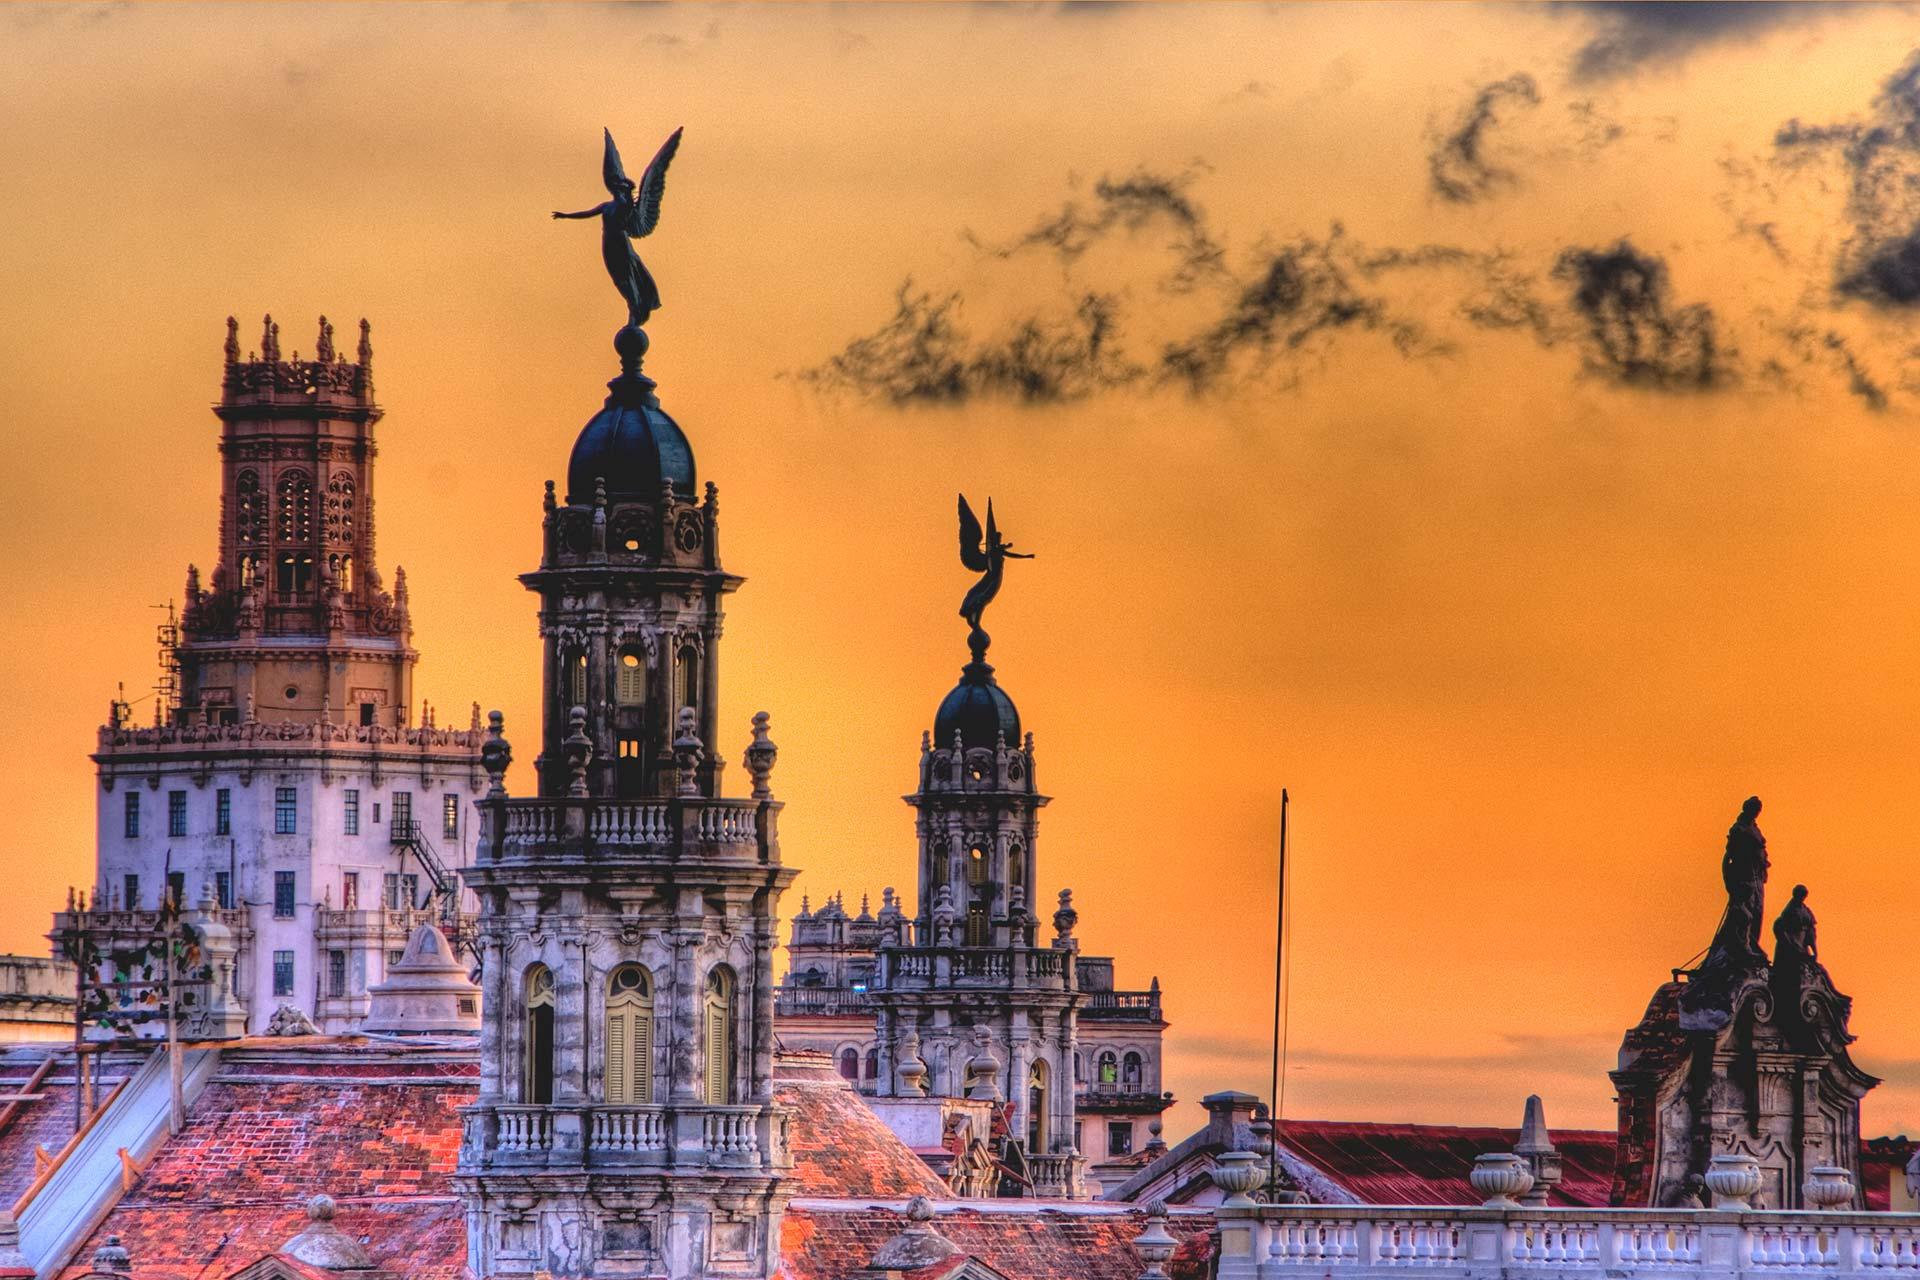 Reisefotografie - Postkarten - Himmel über Havanna, Kuba